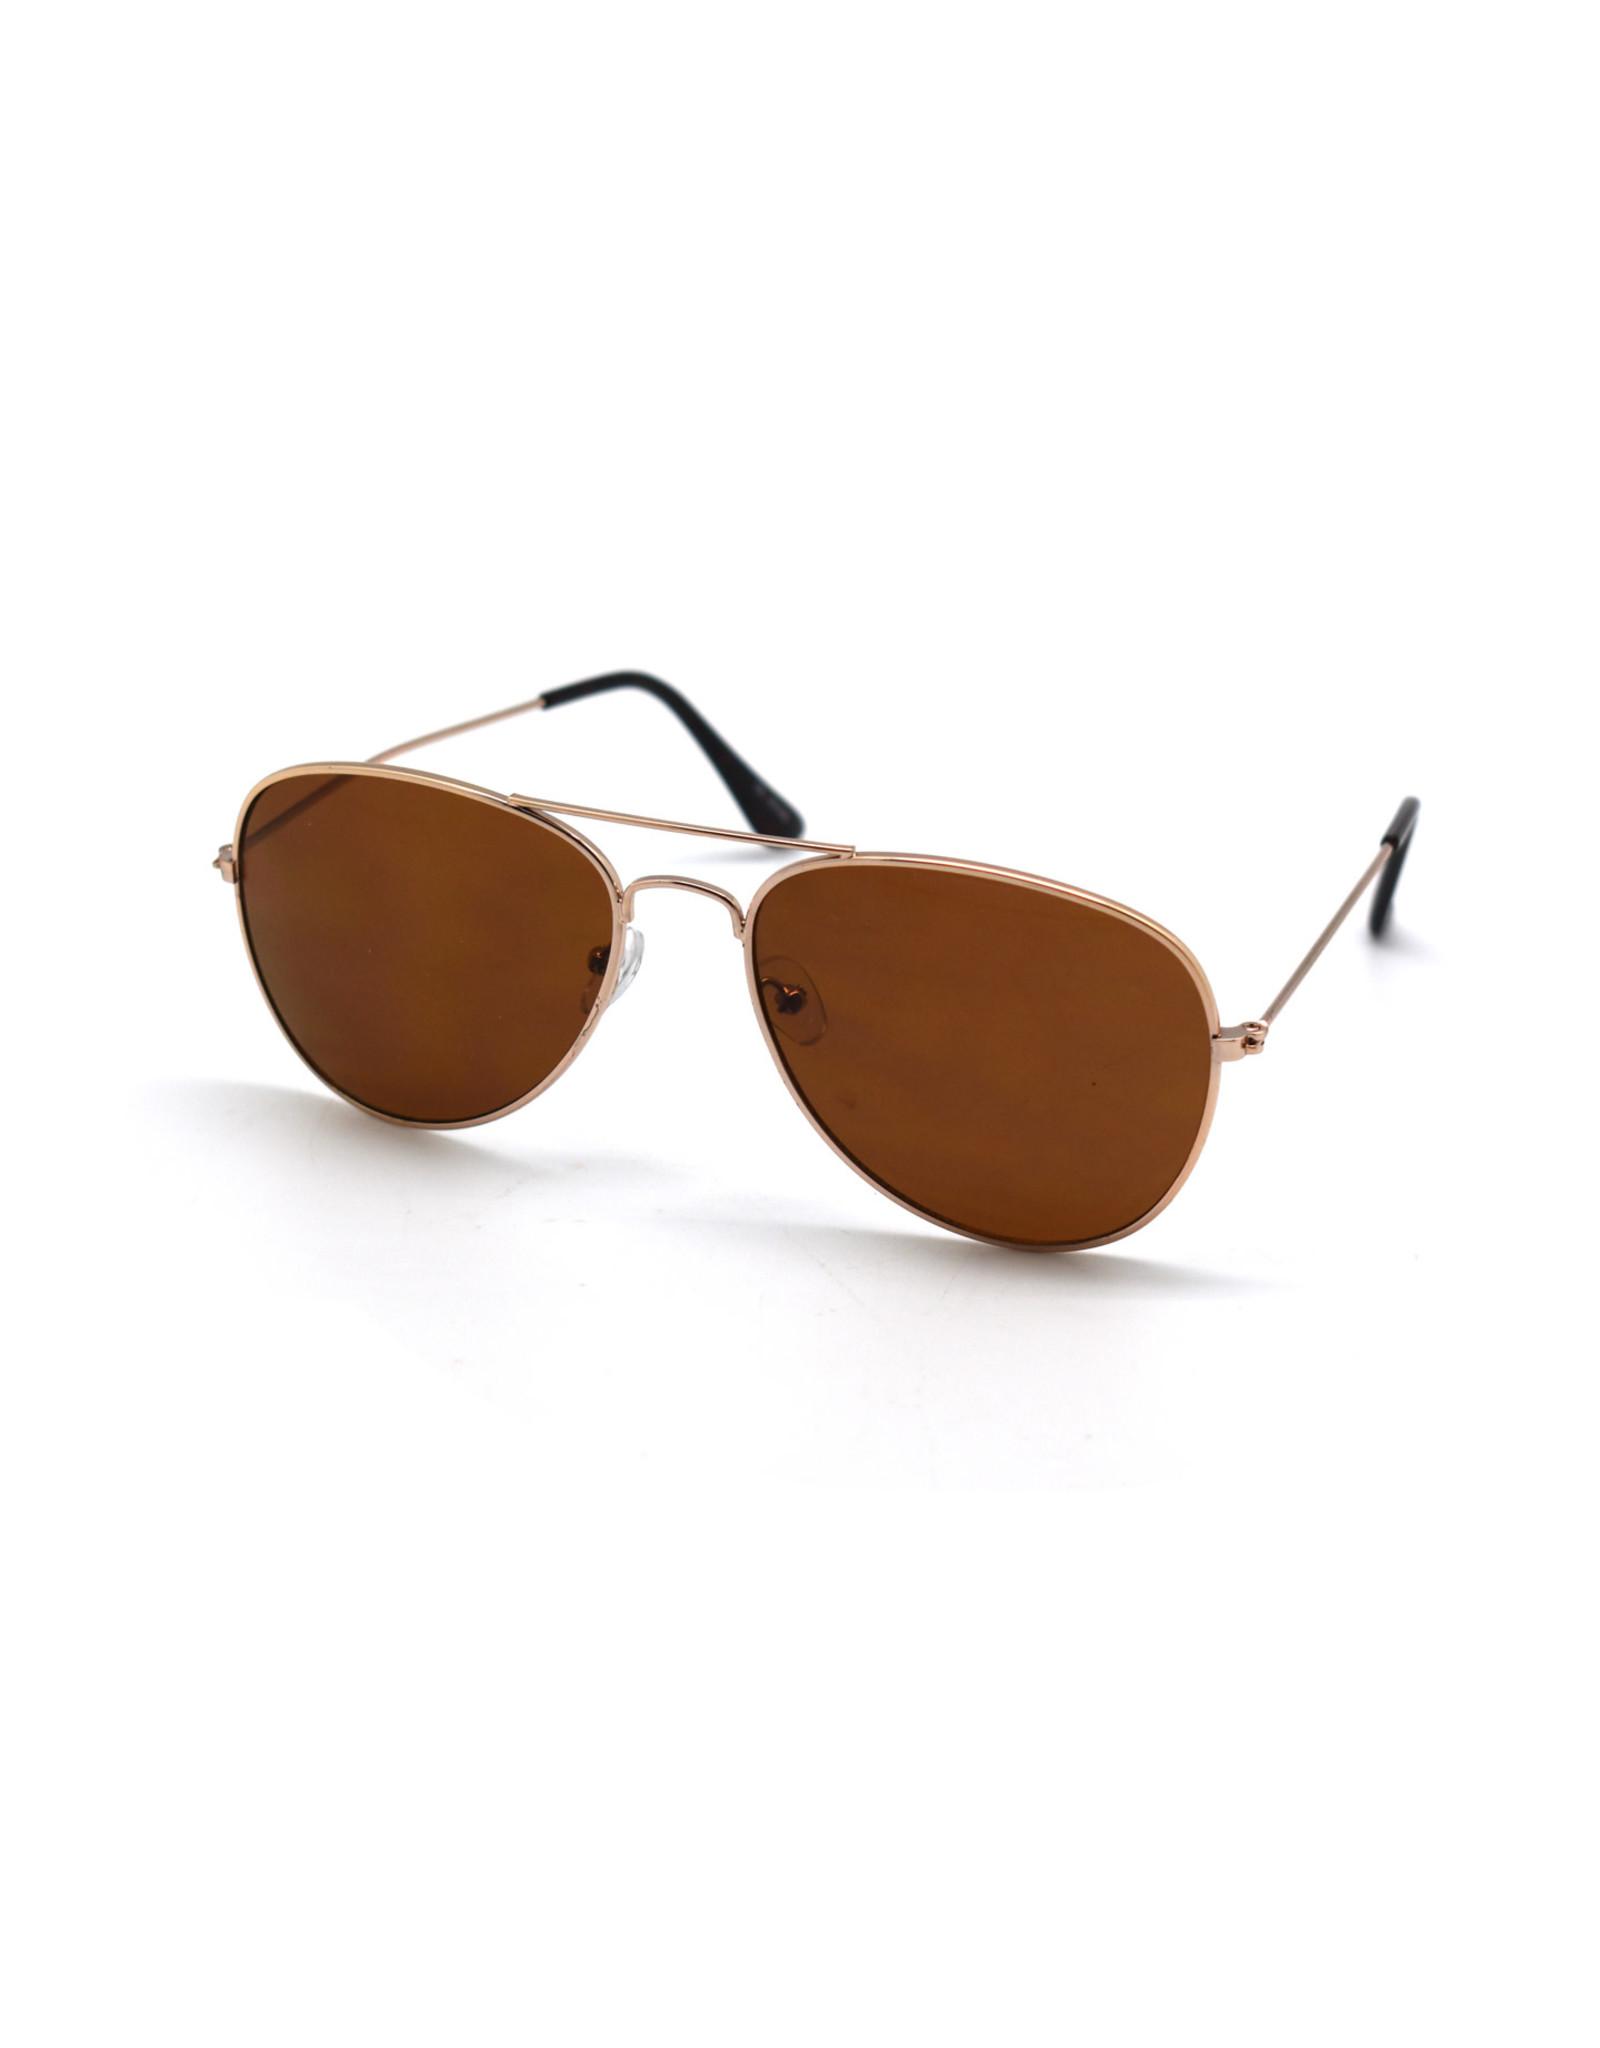 Asher Sunglasses